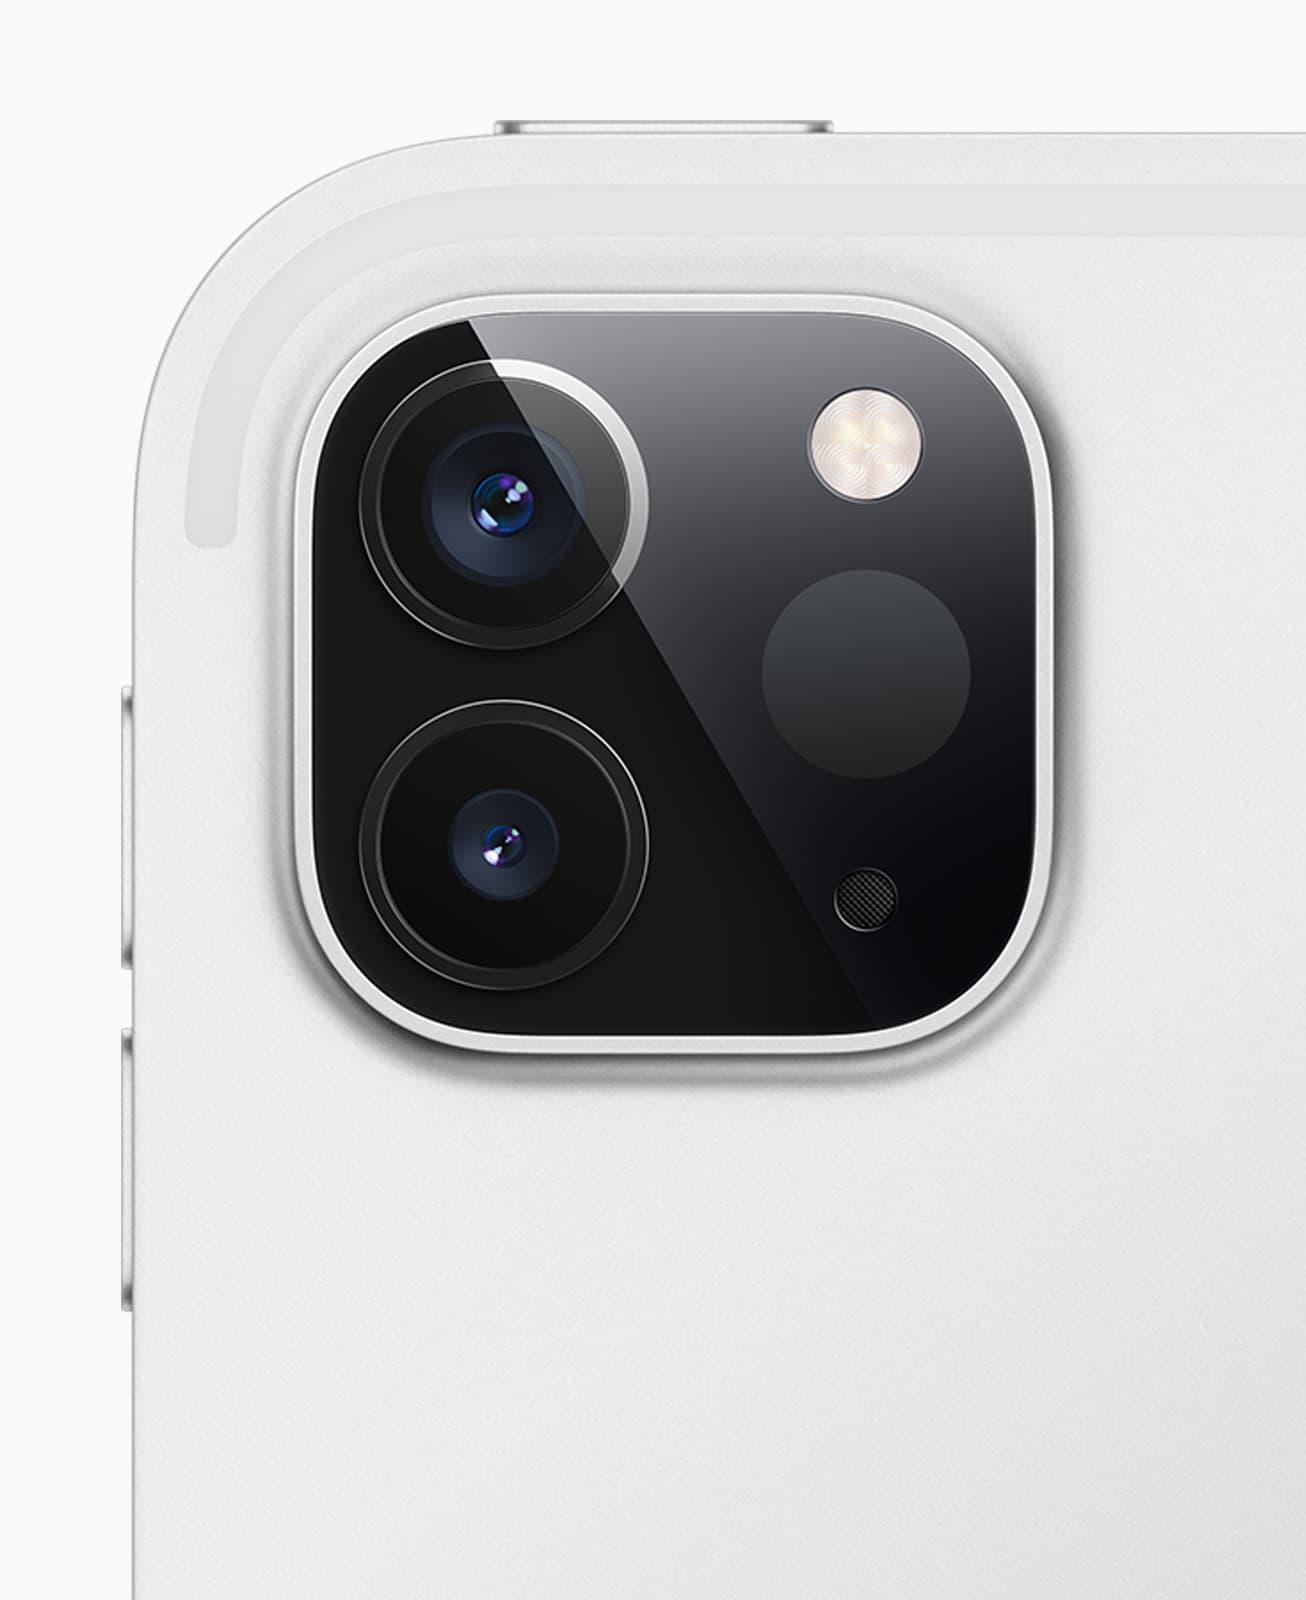 Apple_new-ipad-pro-ultra-wide-camera_03182020